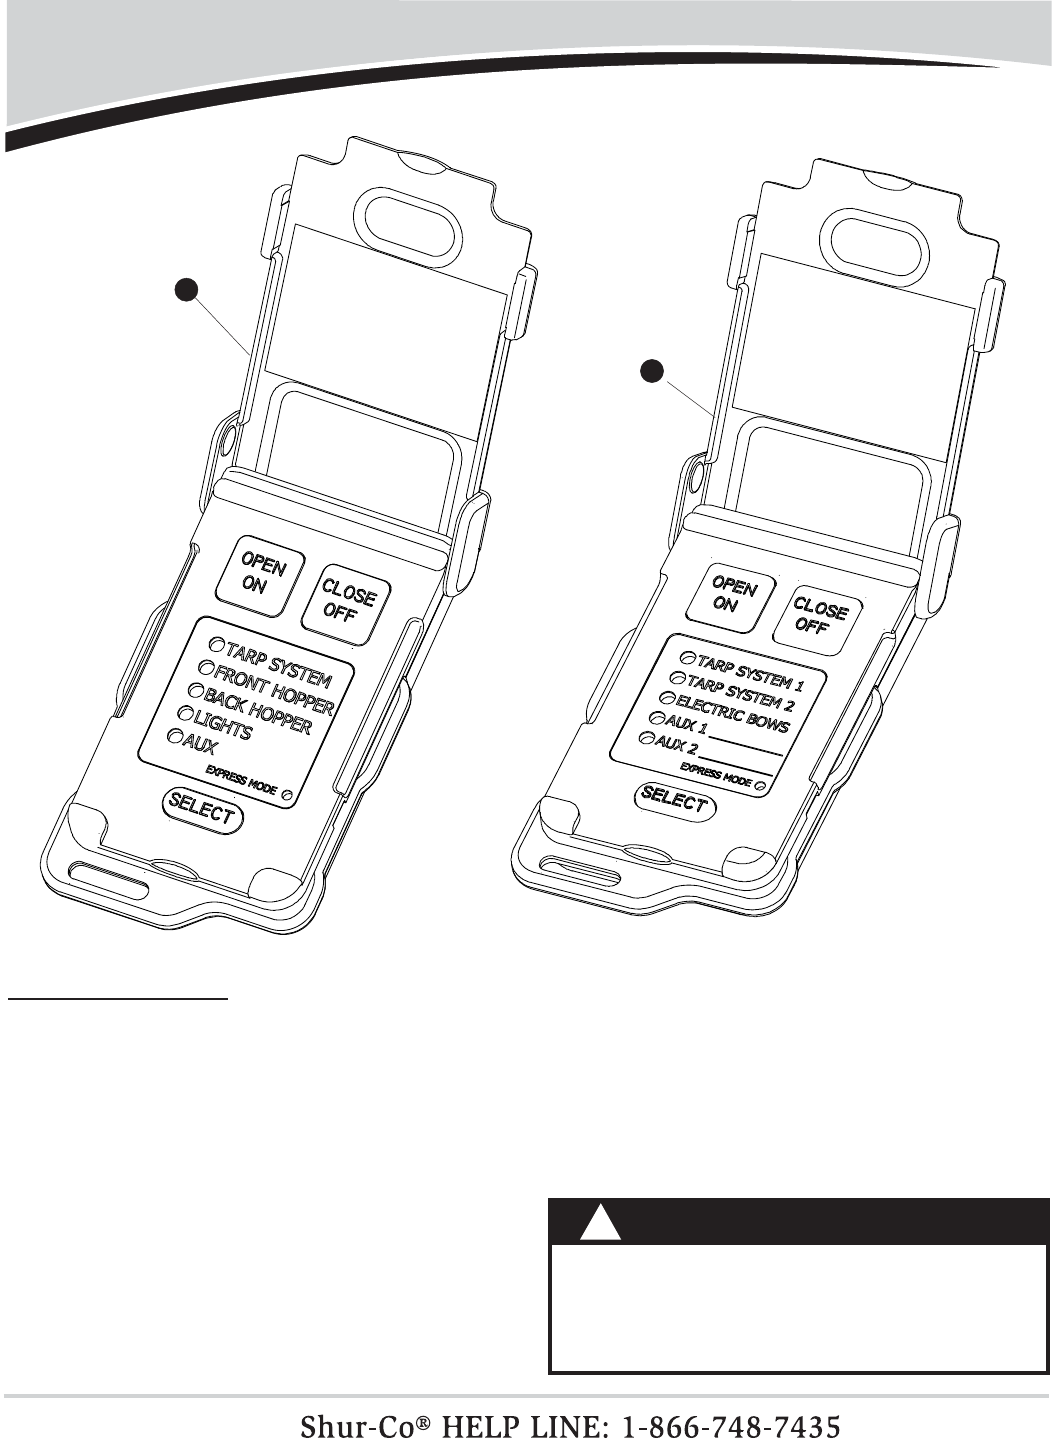 Shur Co SCS1P Wireless Remote User Manual 1123159 Smart 1